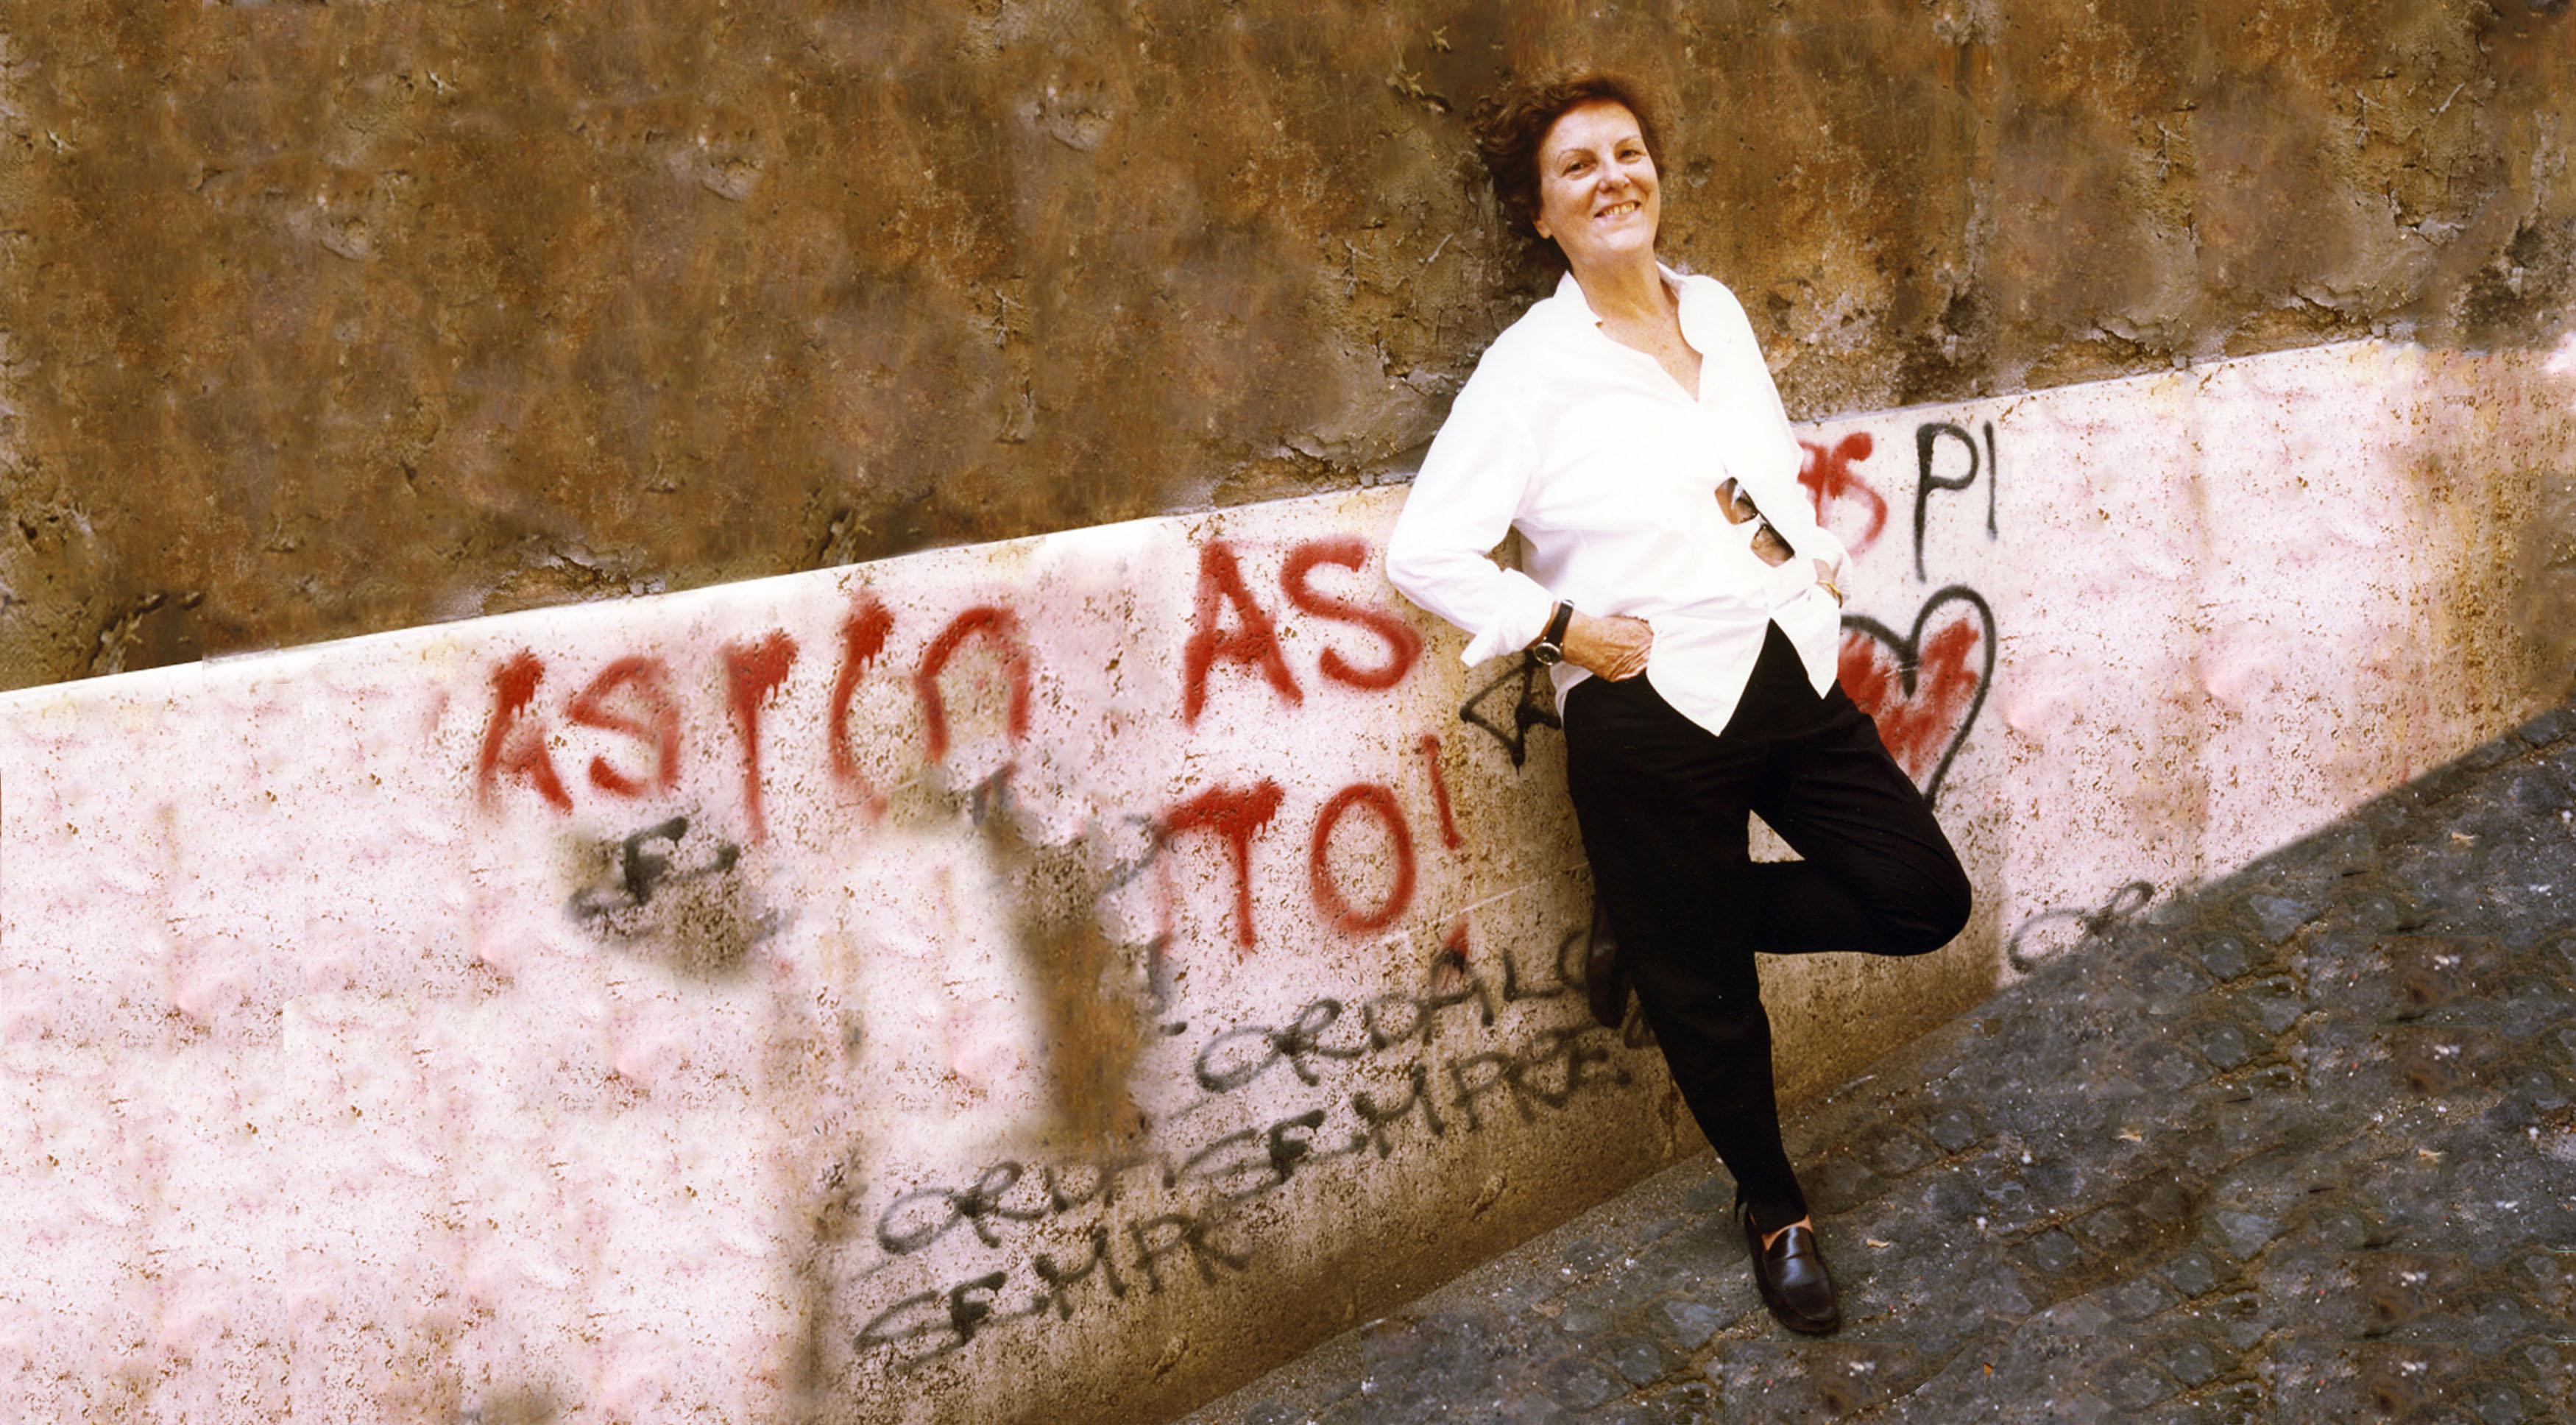 Masterclass Liliana Cavani